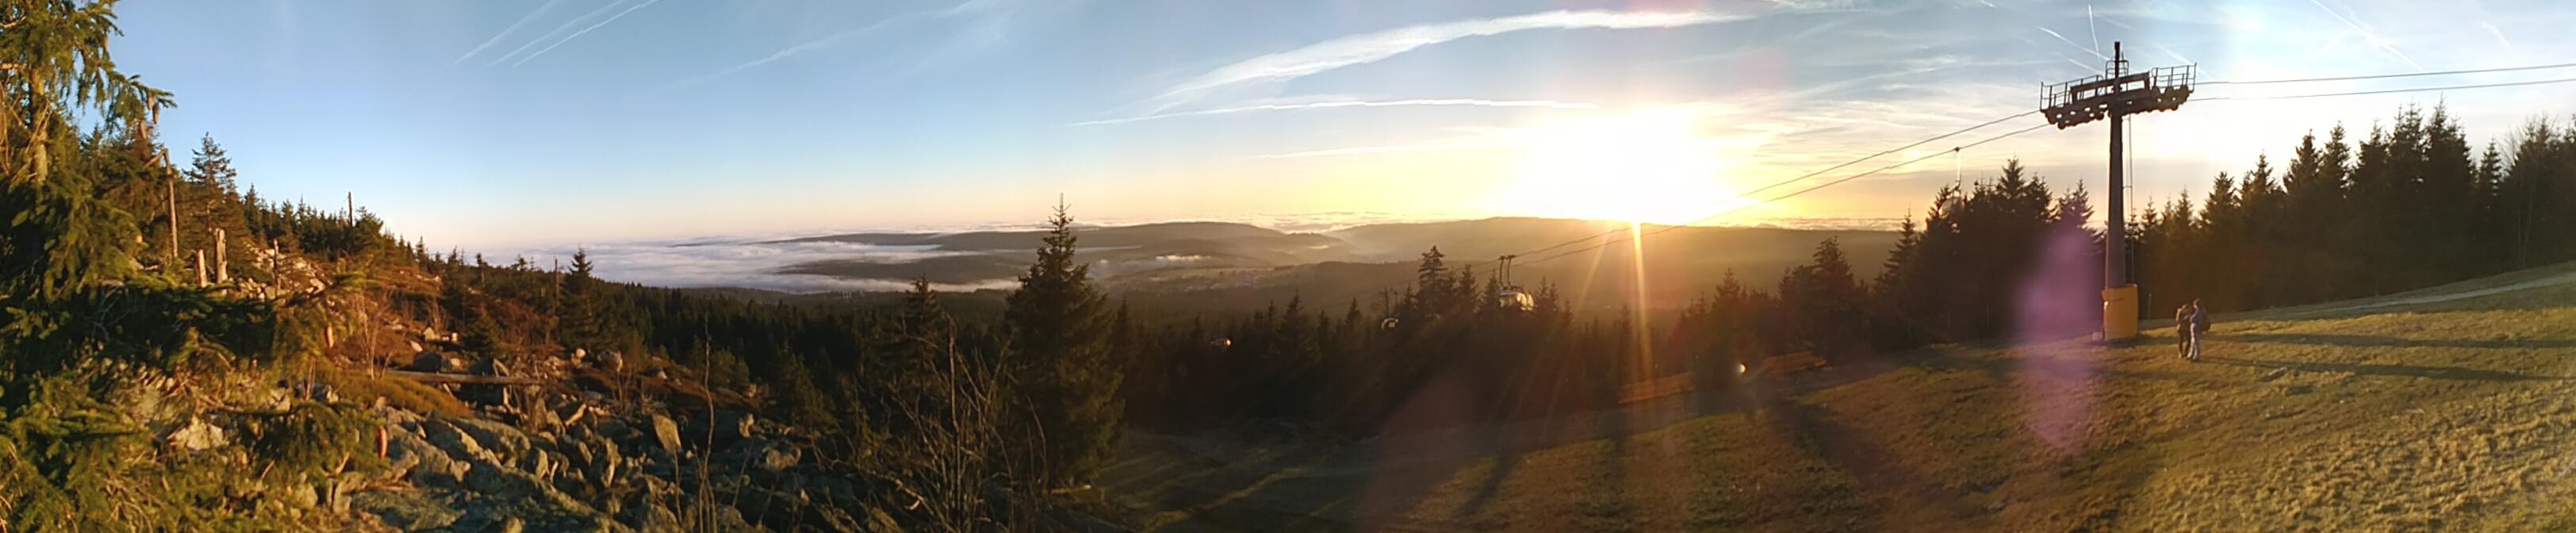 Ochsenkopf - Panorama Herbst